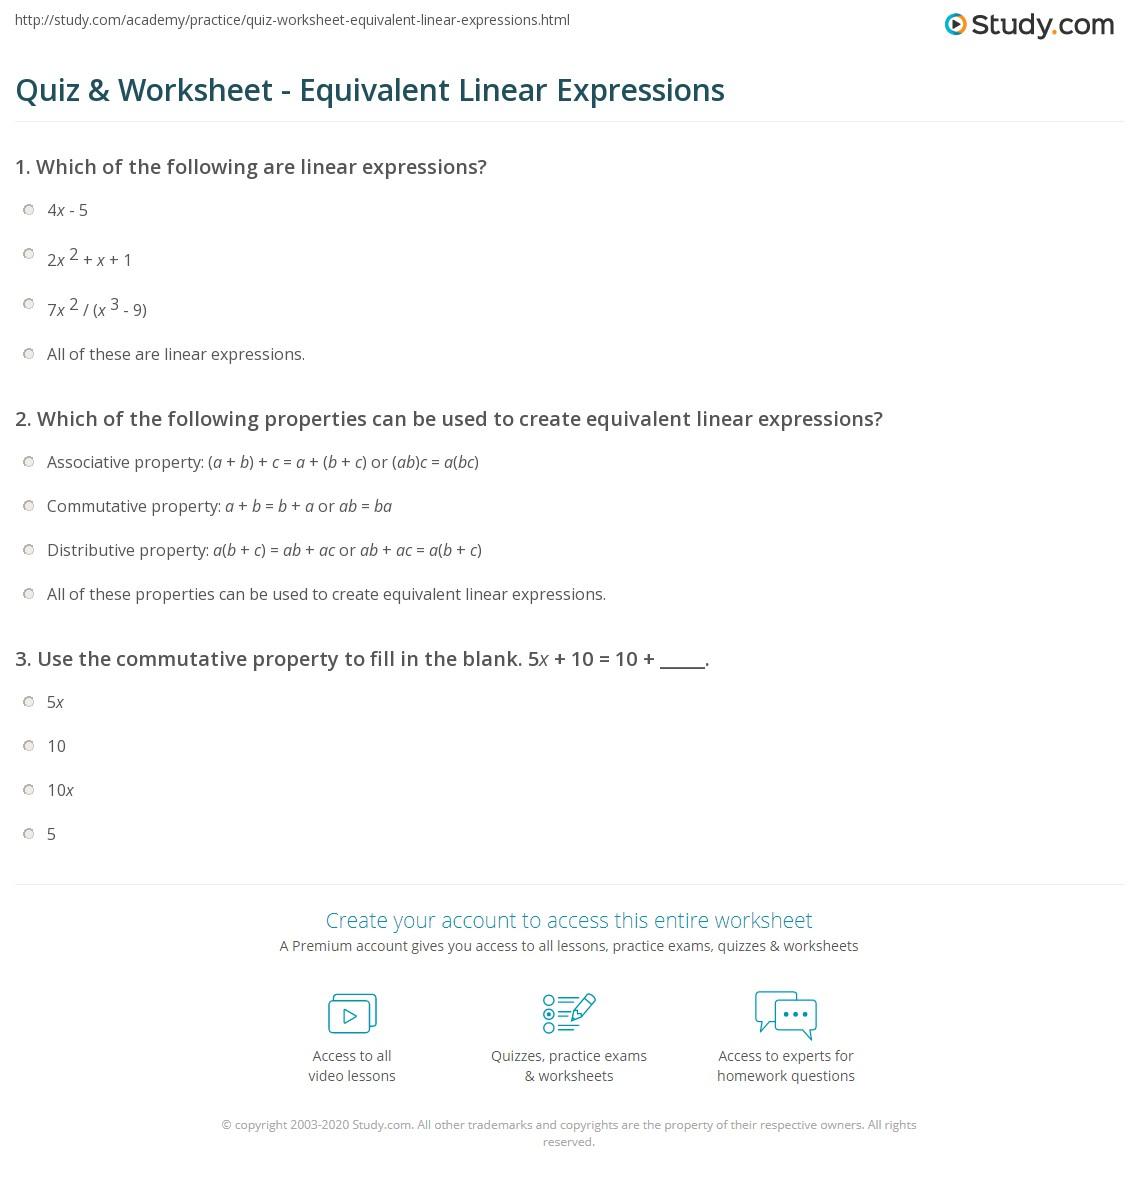 hight resolution of Quiz \u0026 Worksheet - Equivalent Linear Expressions   Study.com